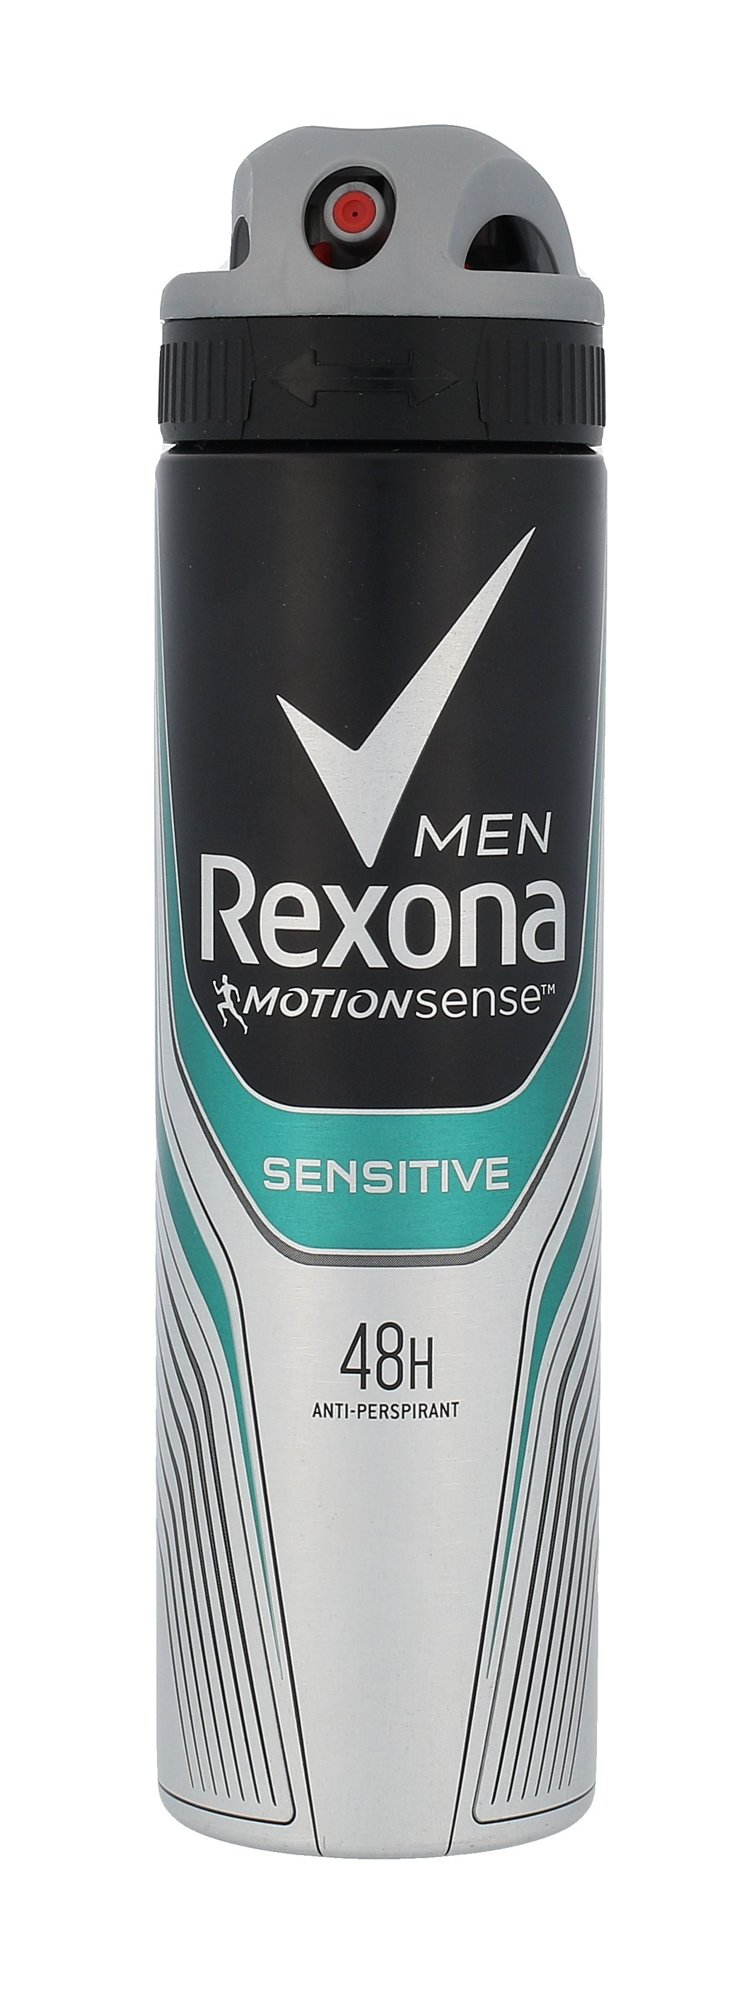 Rexona Men Sensitive 48H Anti-Perspirant Deospray Cosmetic 150ml